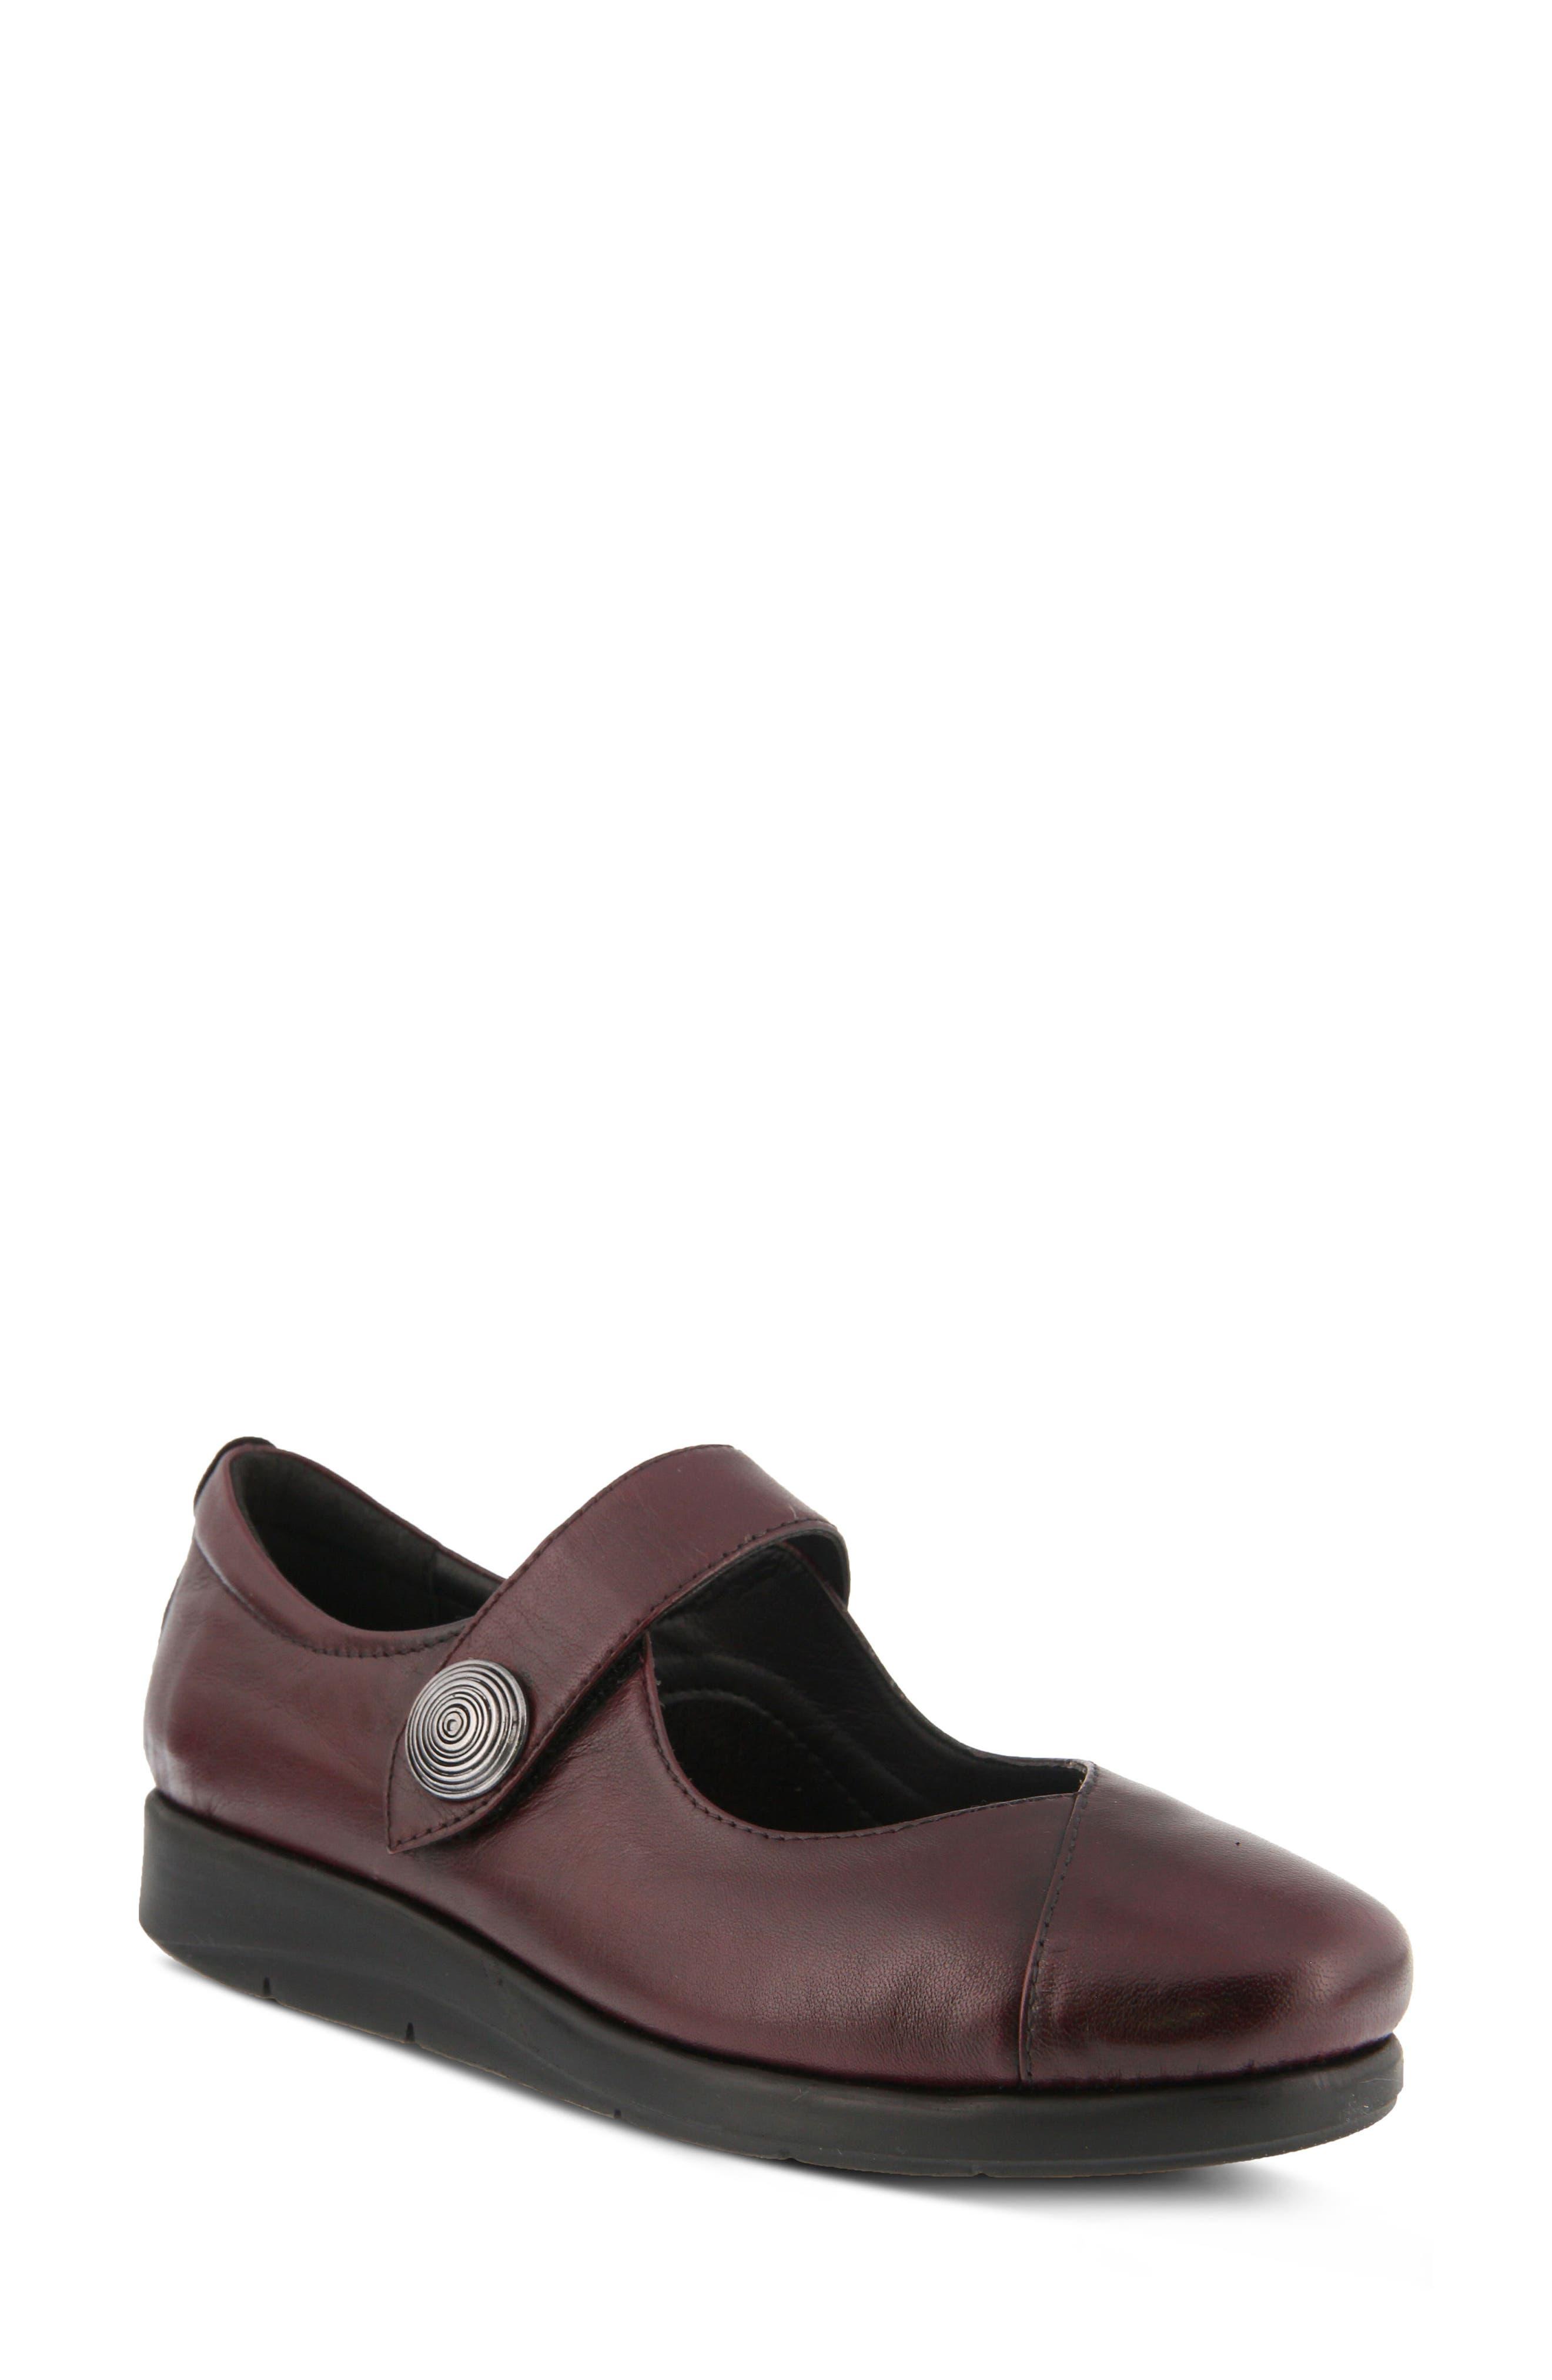 Zemira Flat,                             Main thumbnail 1, color,                             Bordeaux Leather